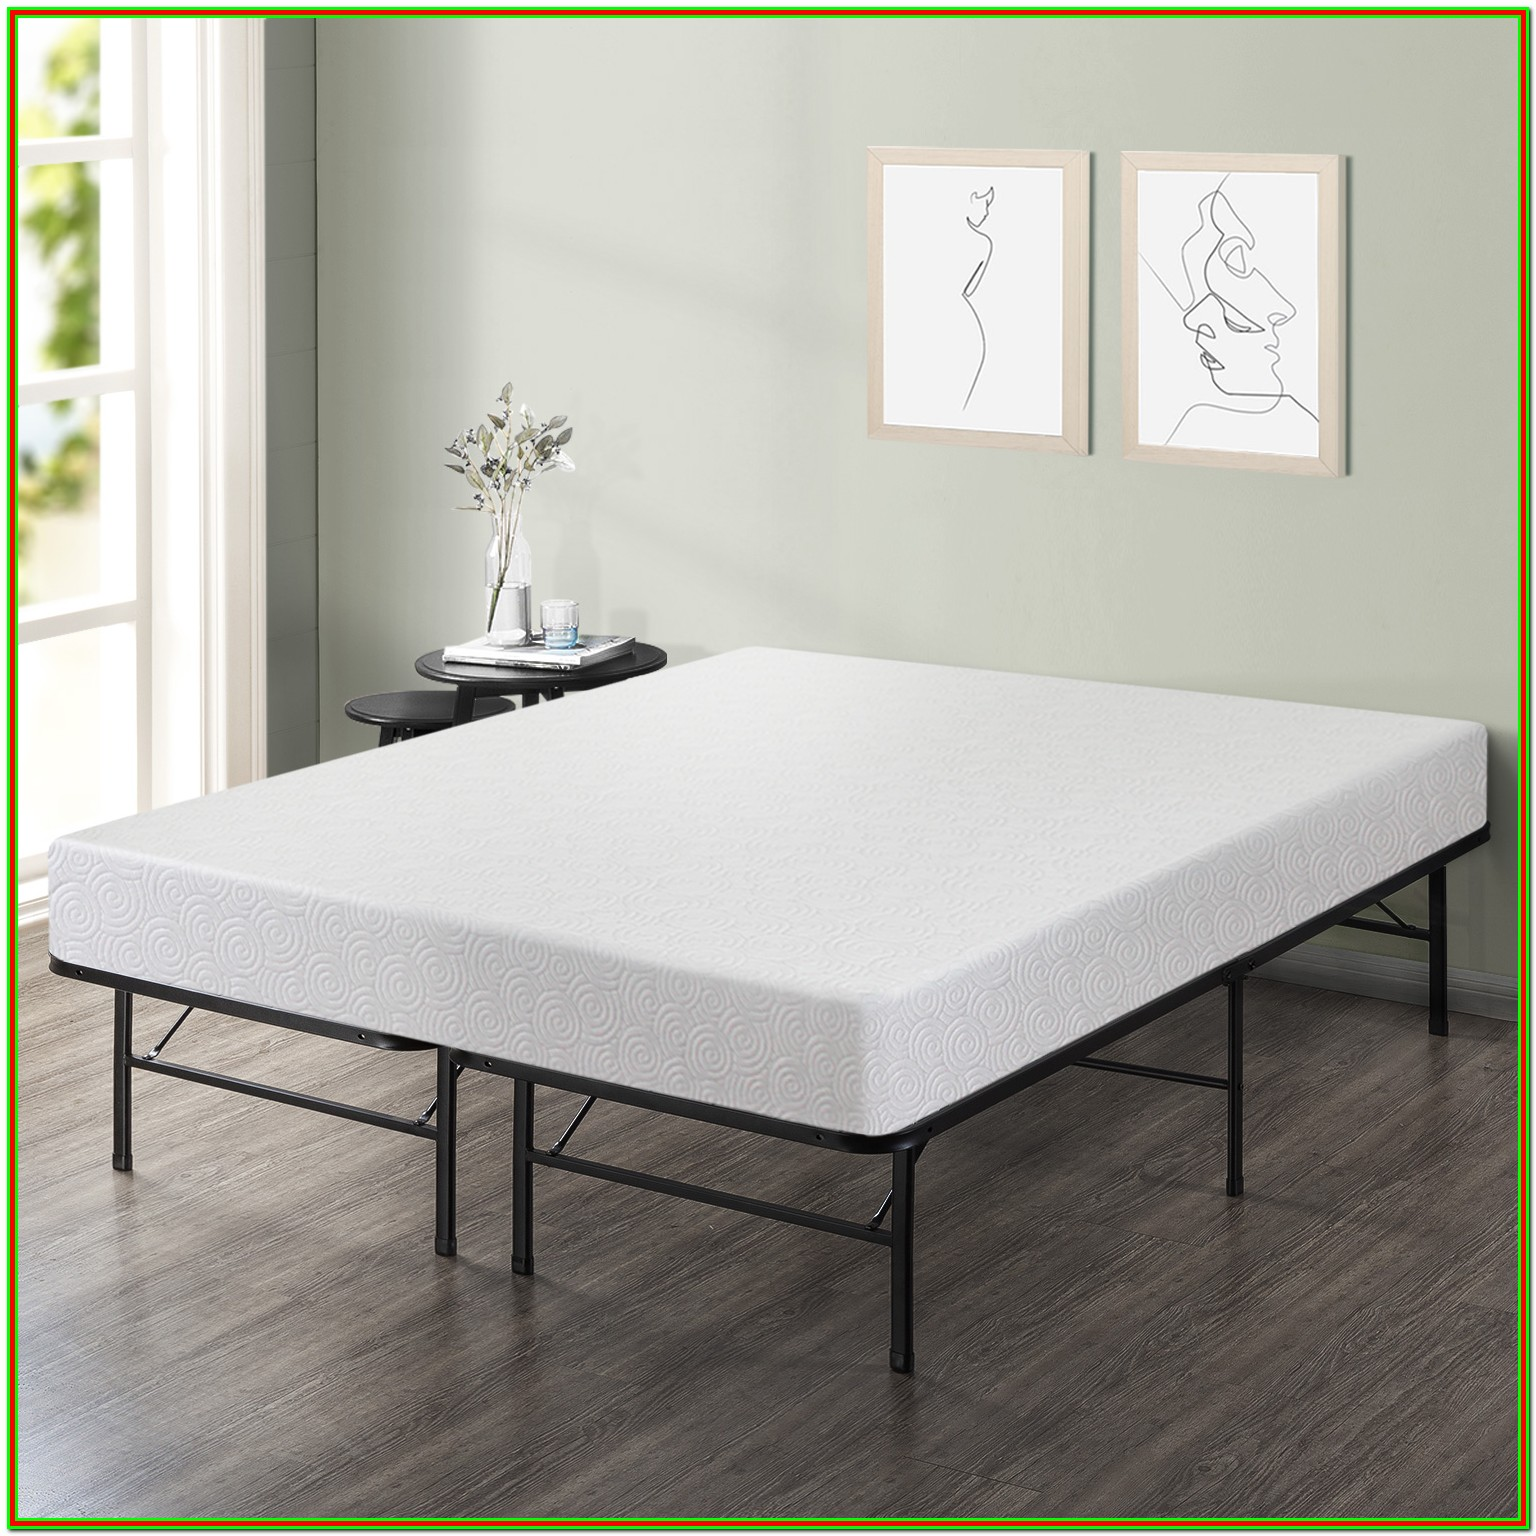 Best Mattress Thickness For Platform Bed